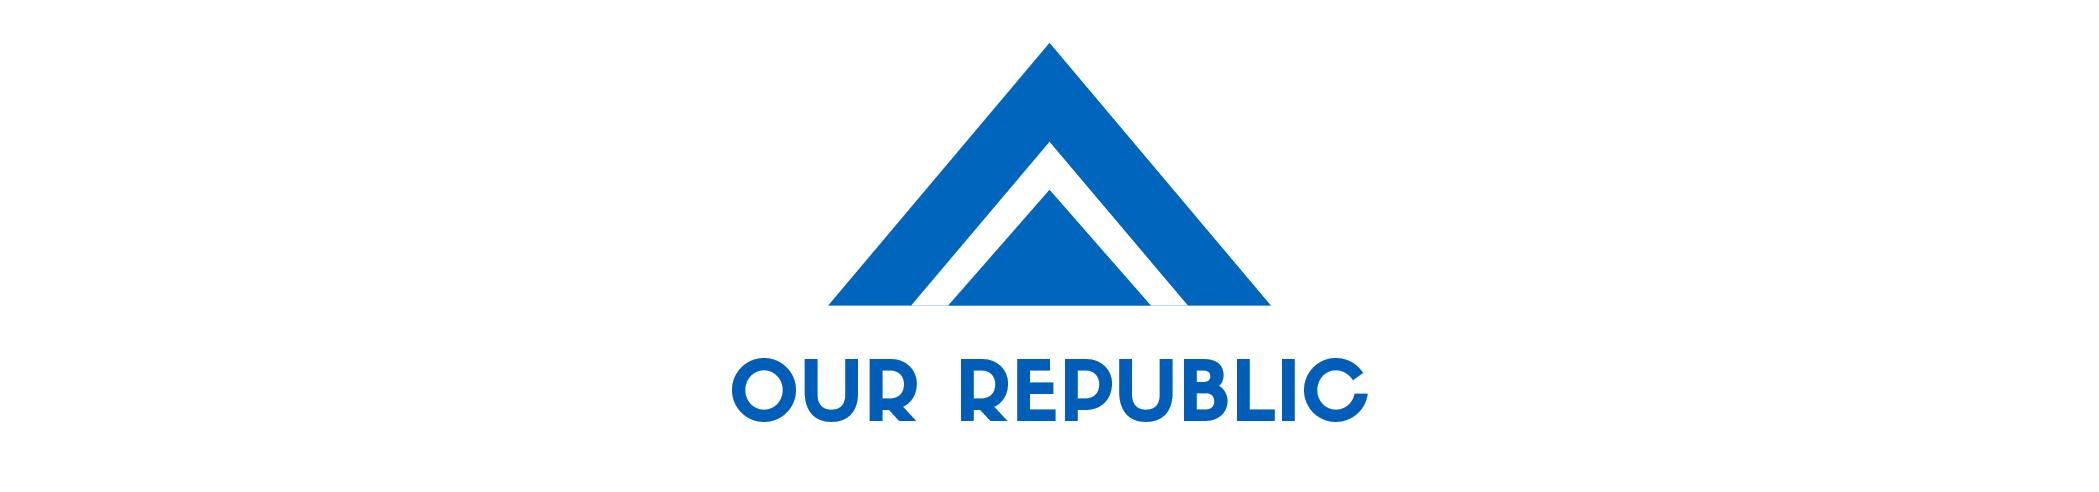 Our Republic